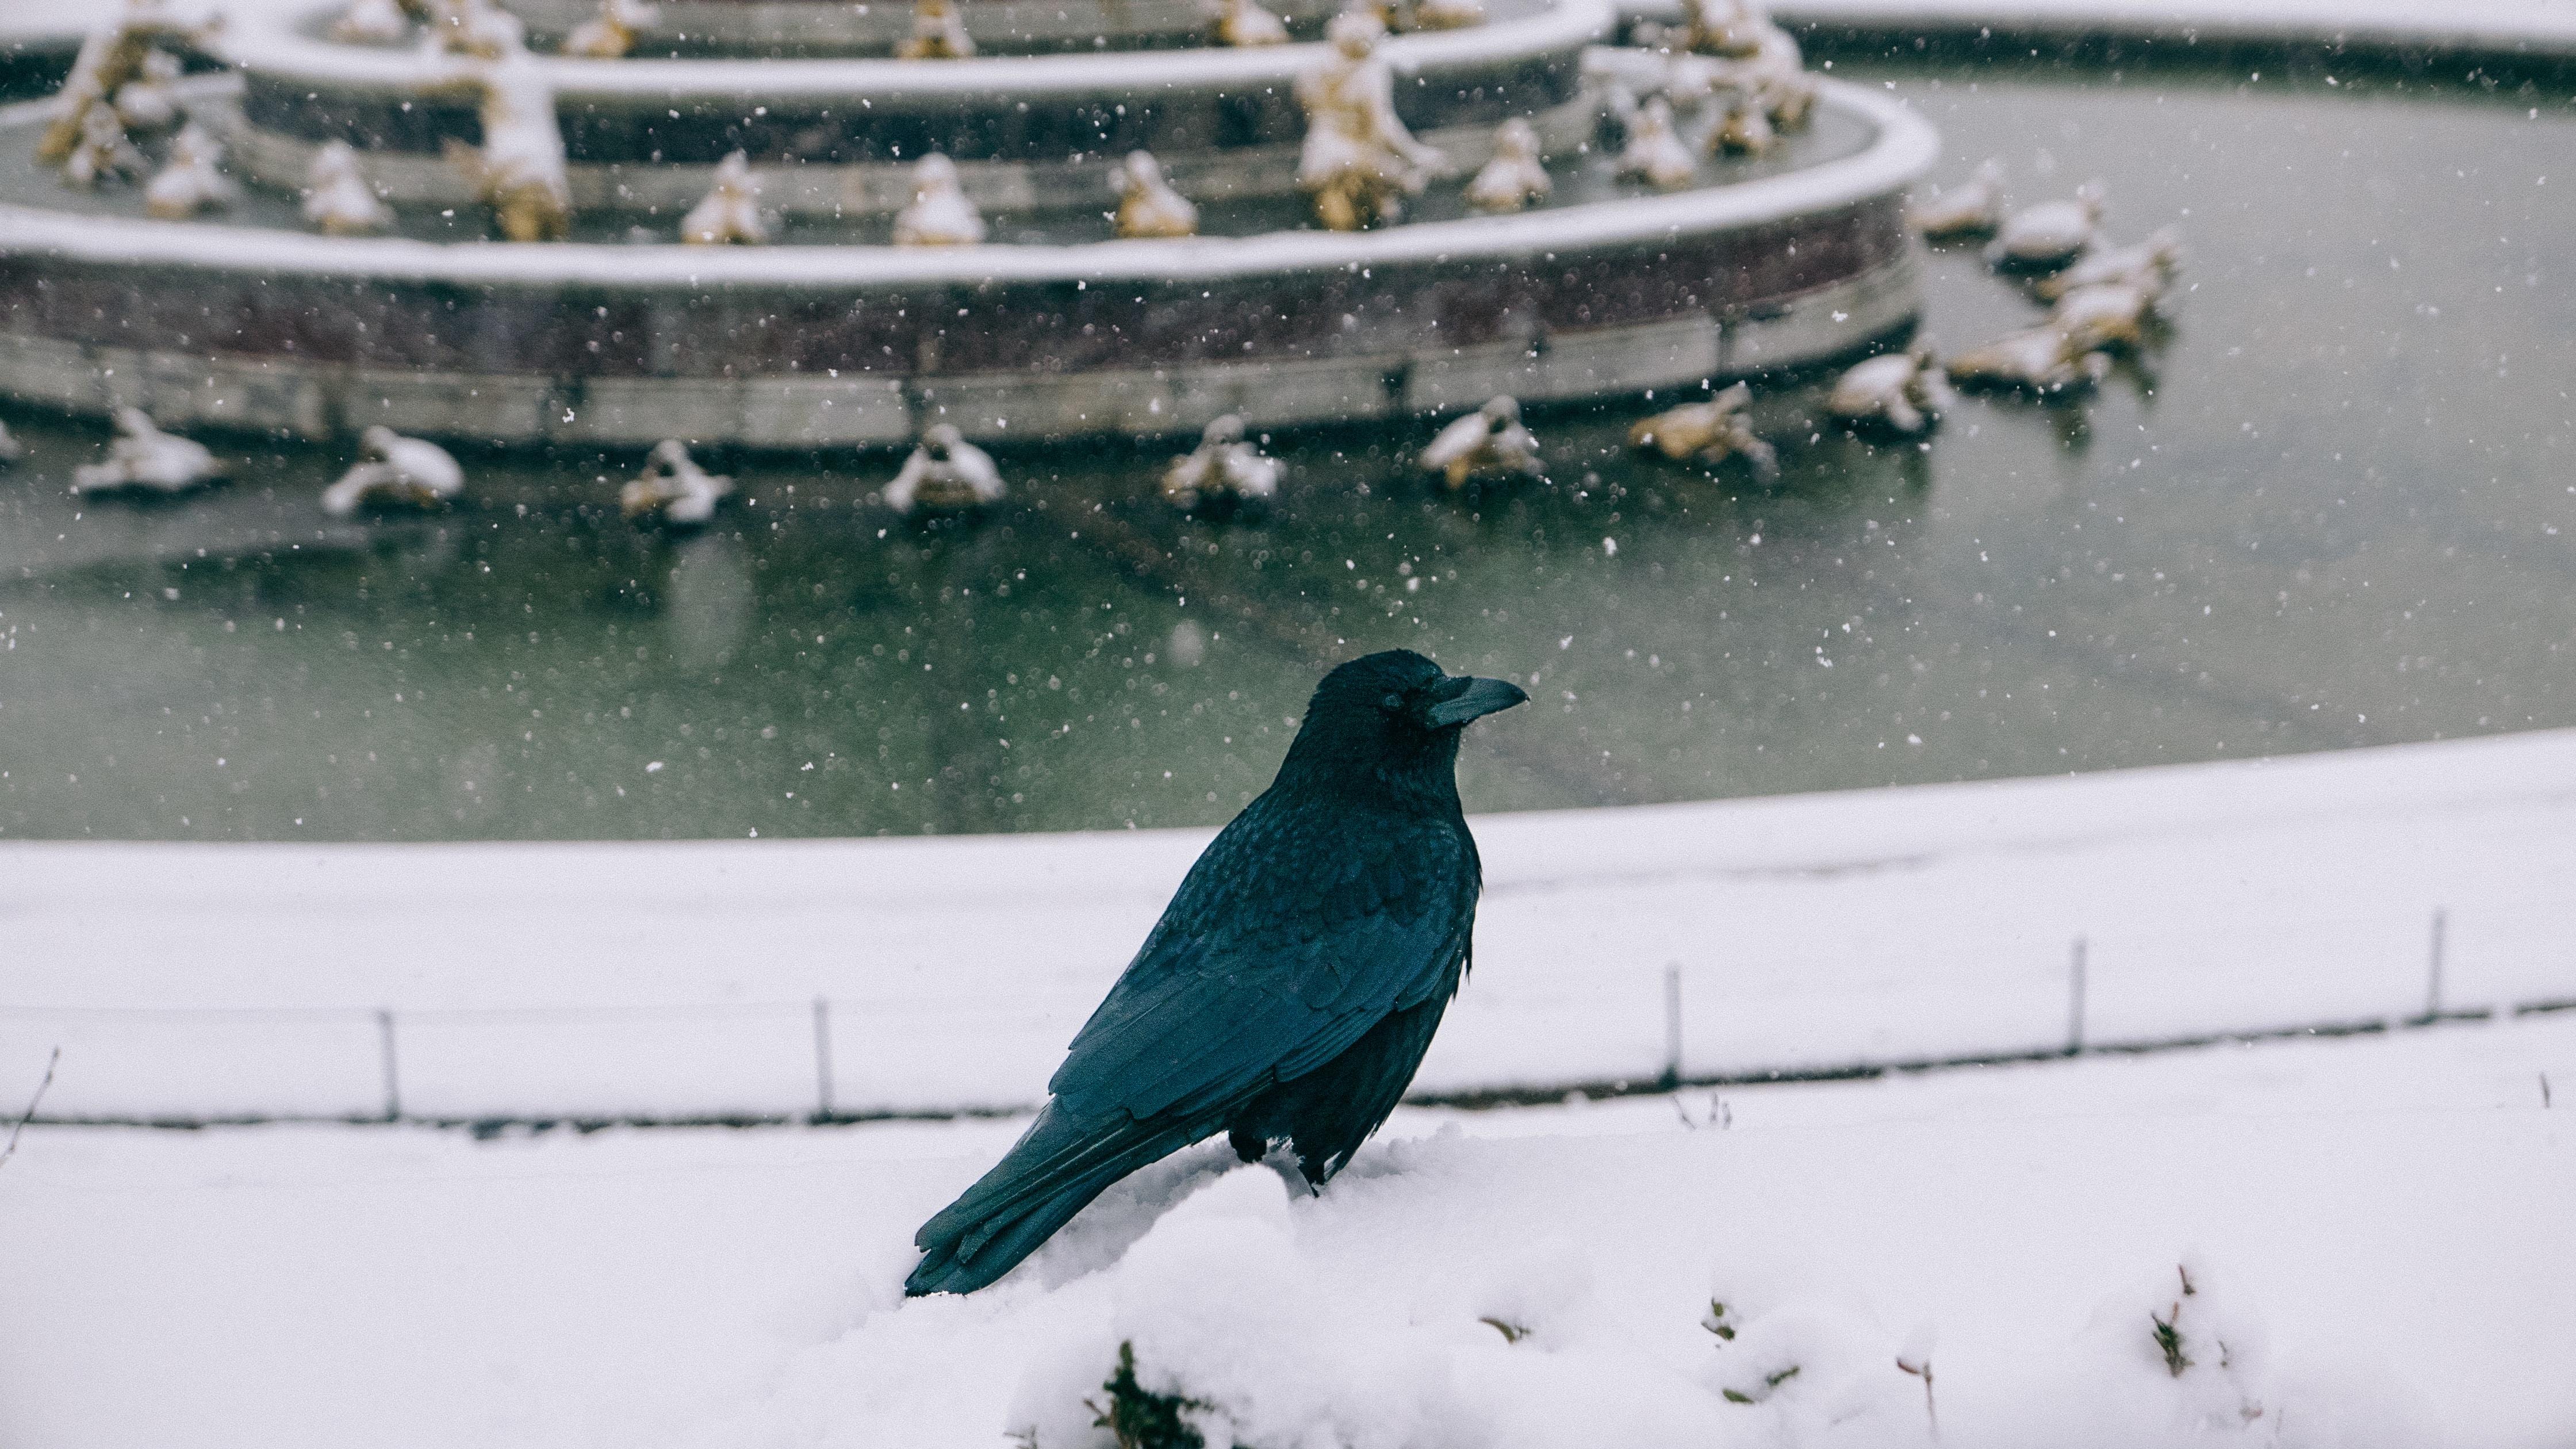 black bird on white surface